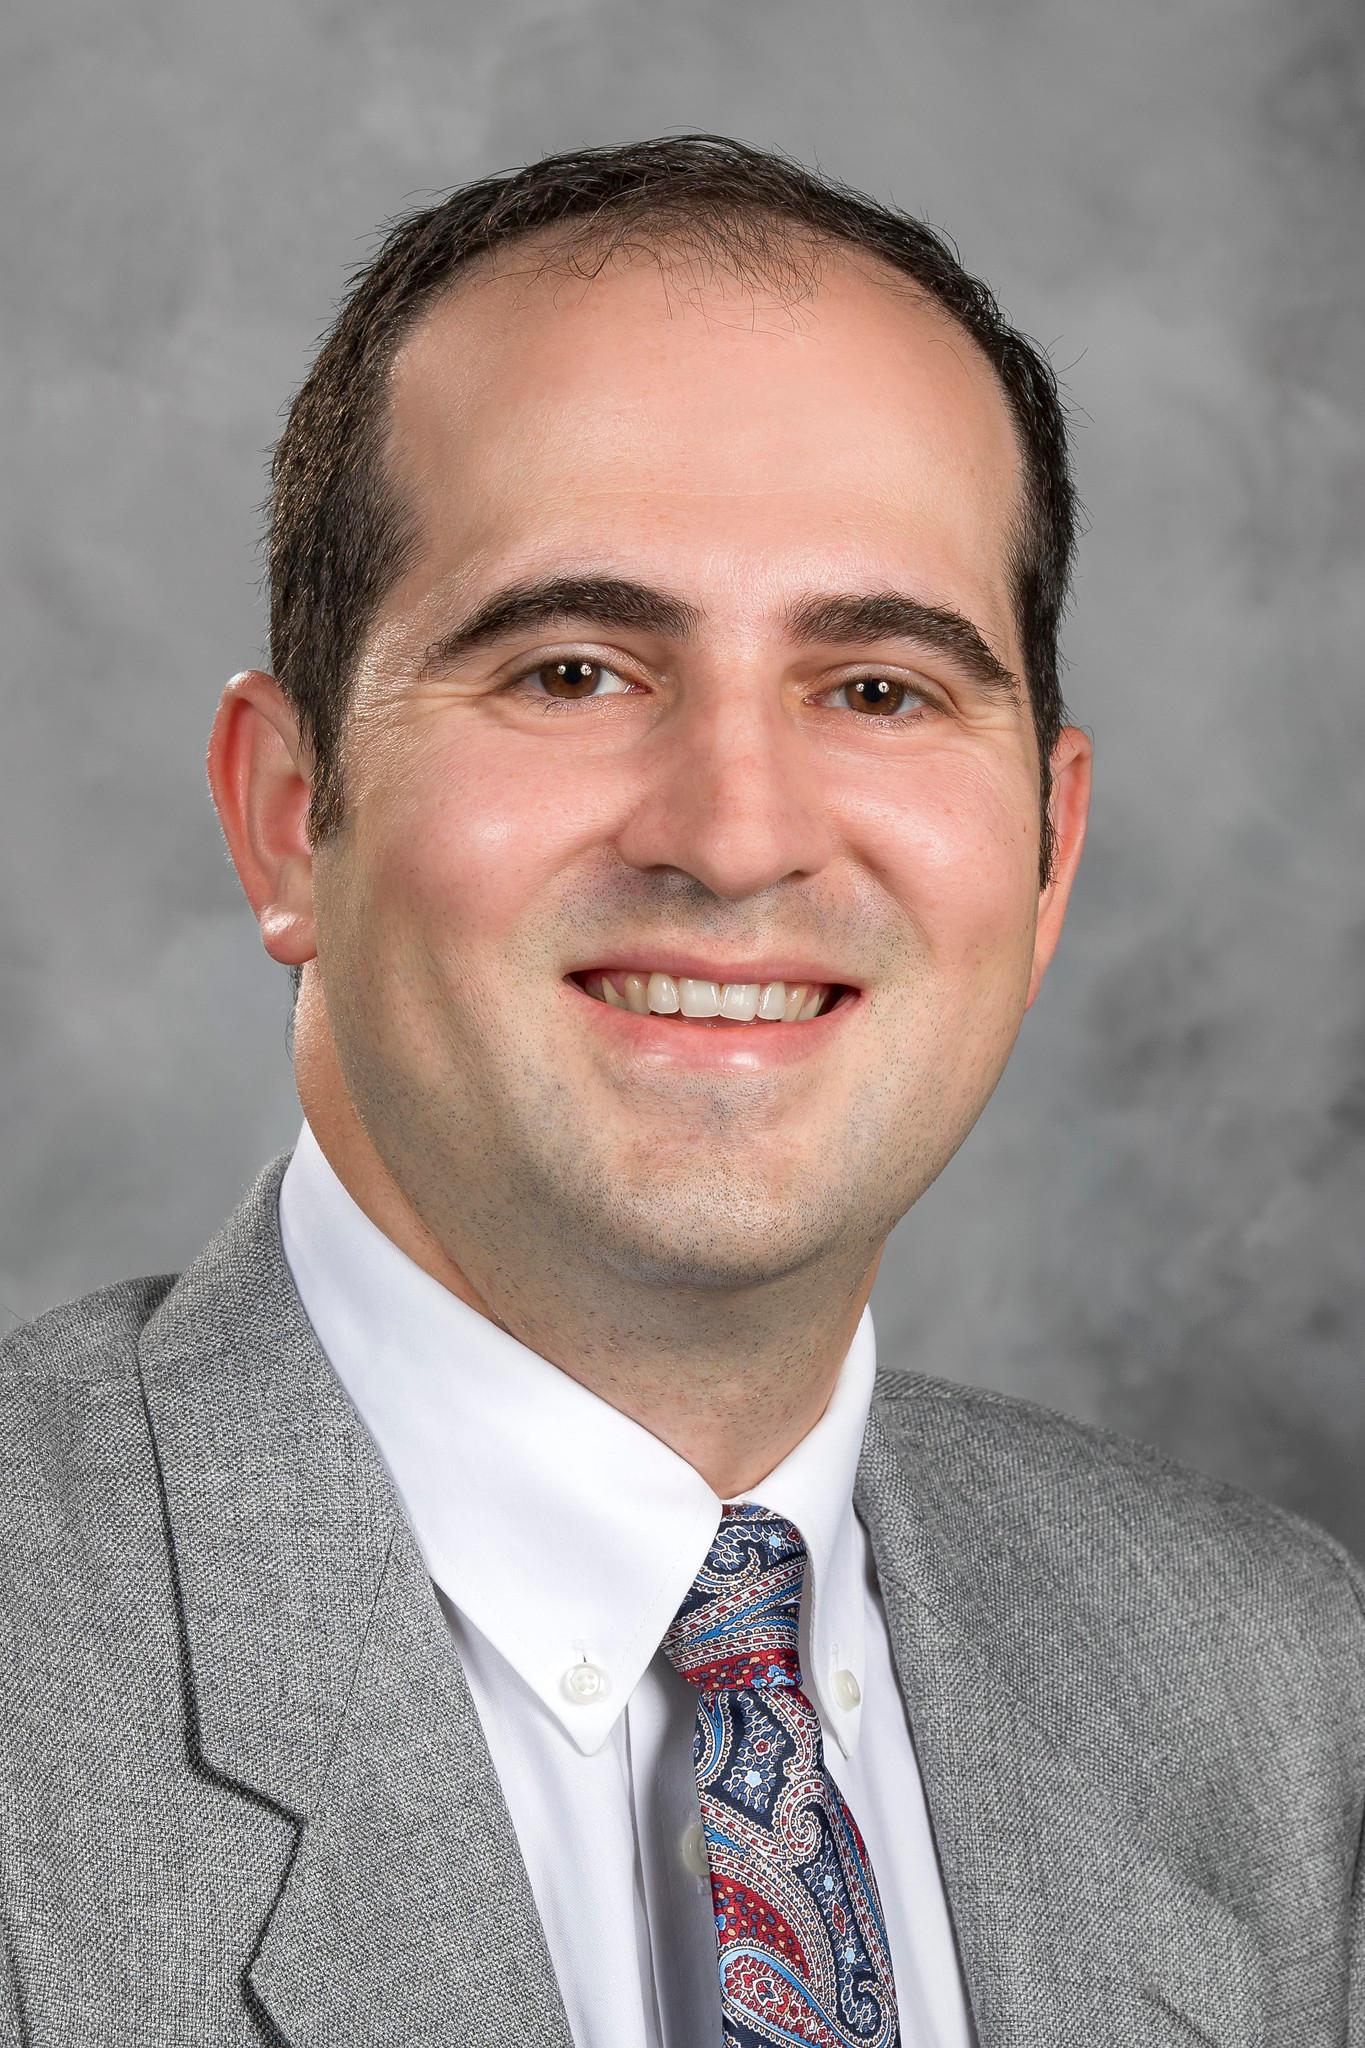 Jose Manuel Perez Yordan, MD